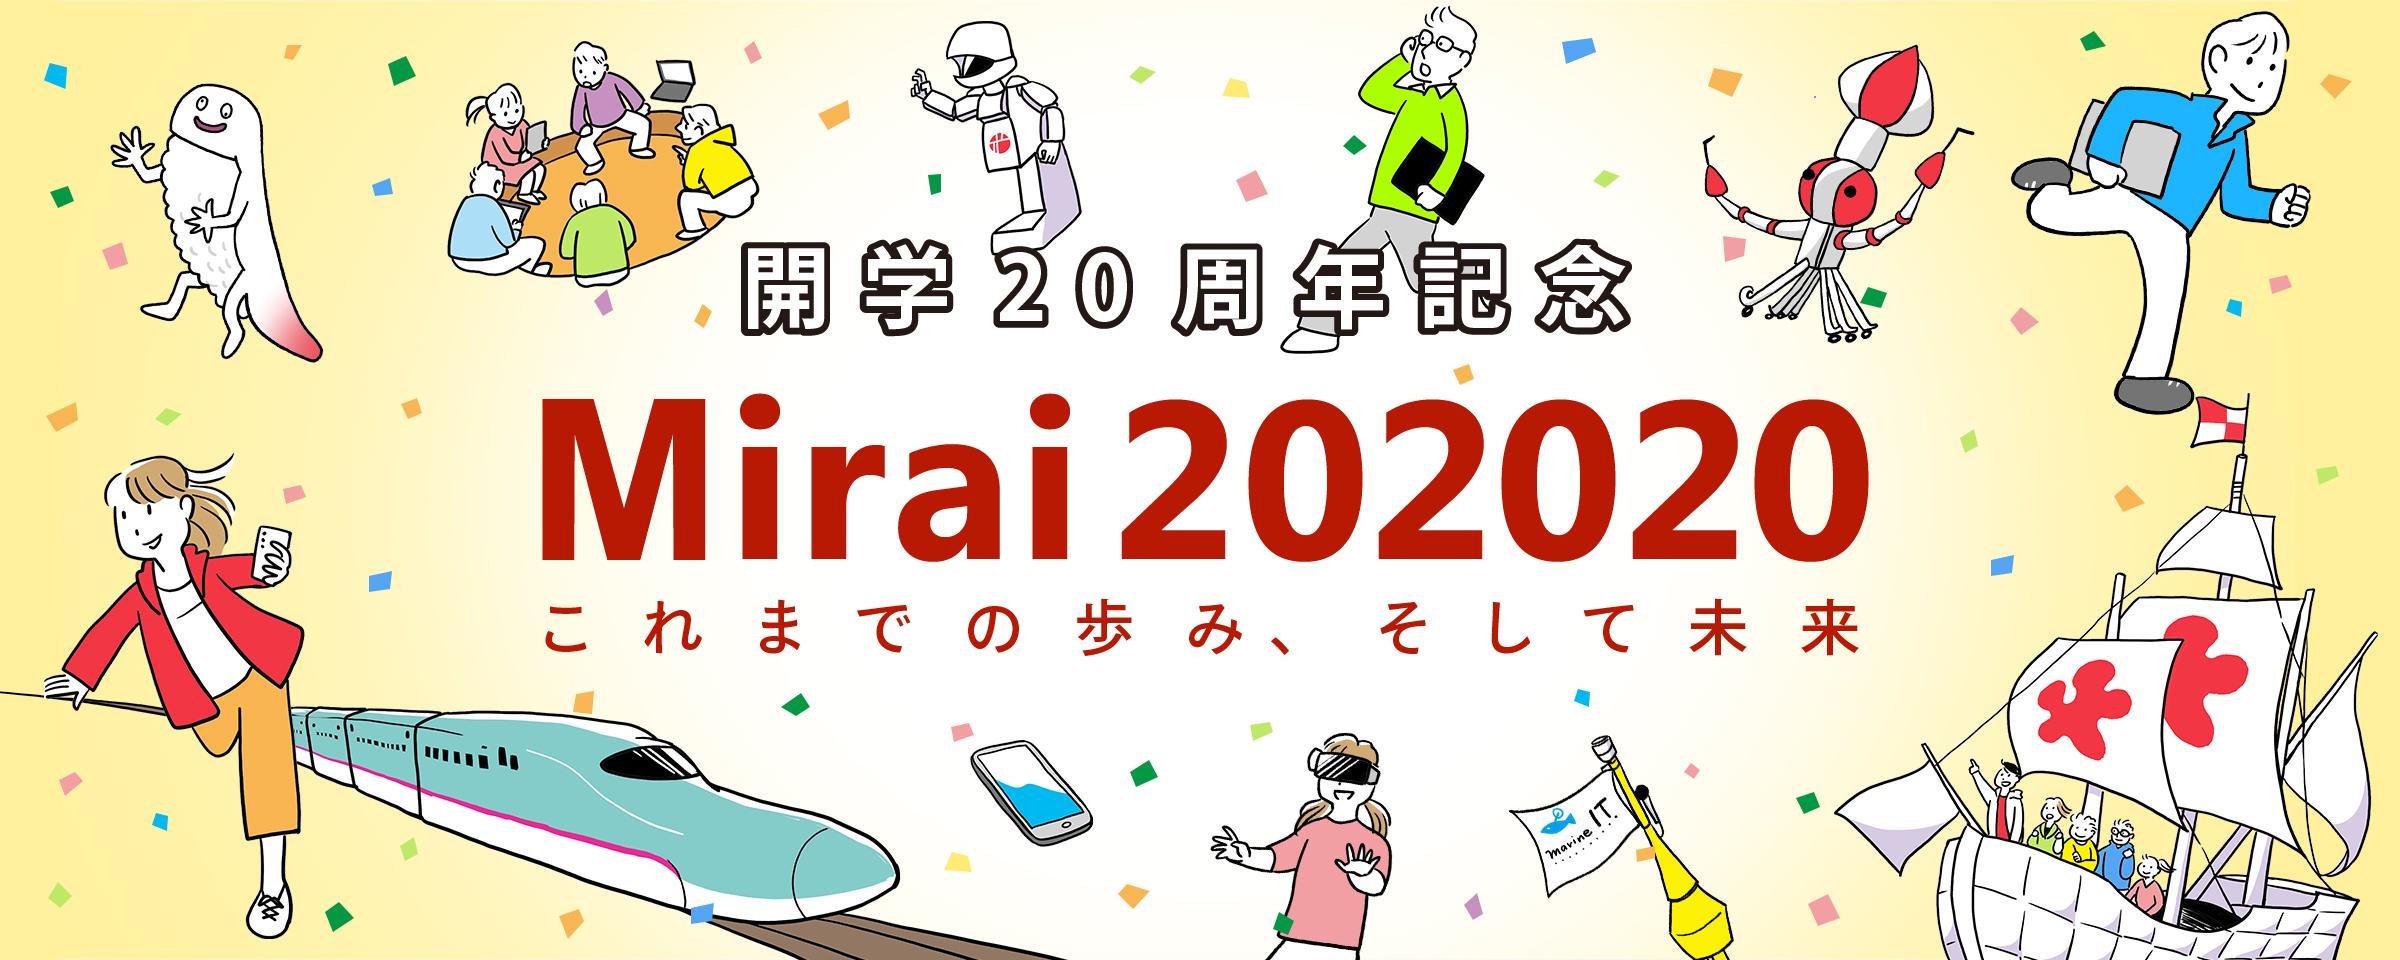 Mirai202020のバナー